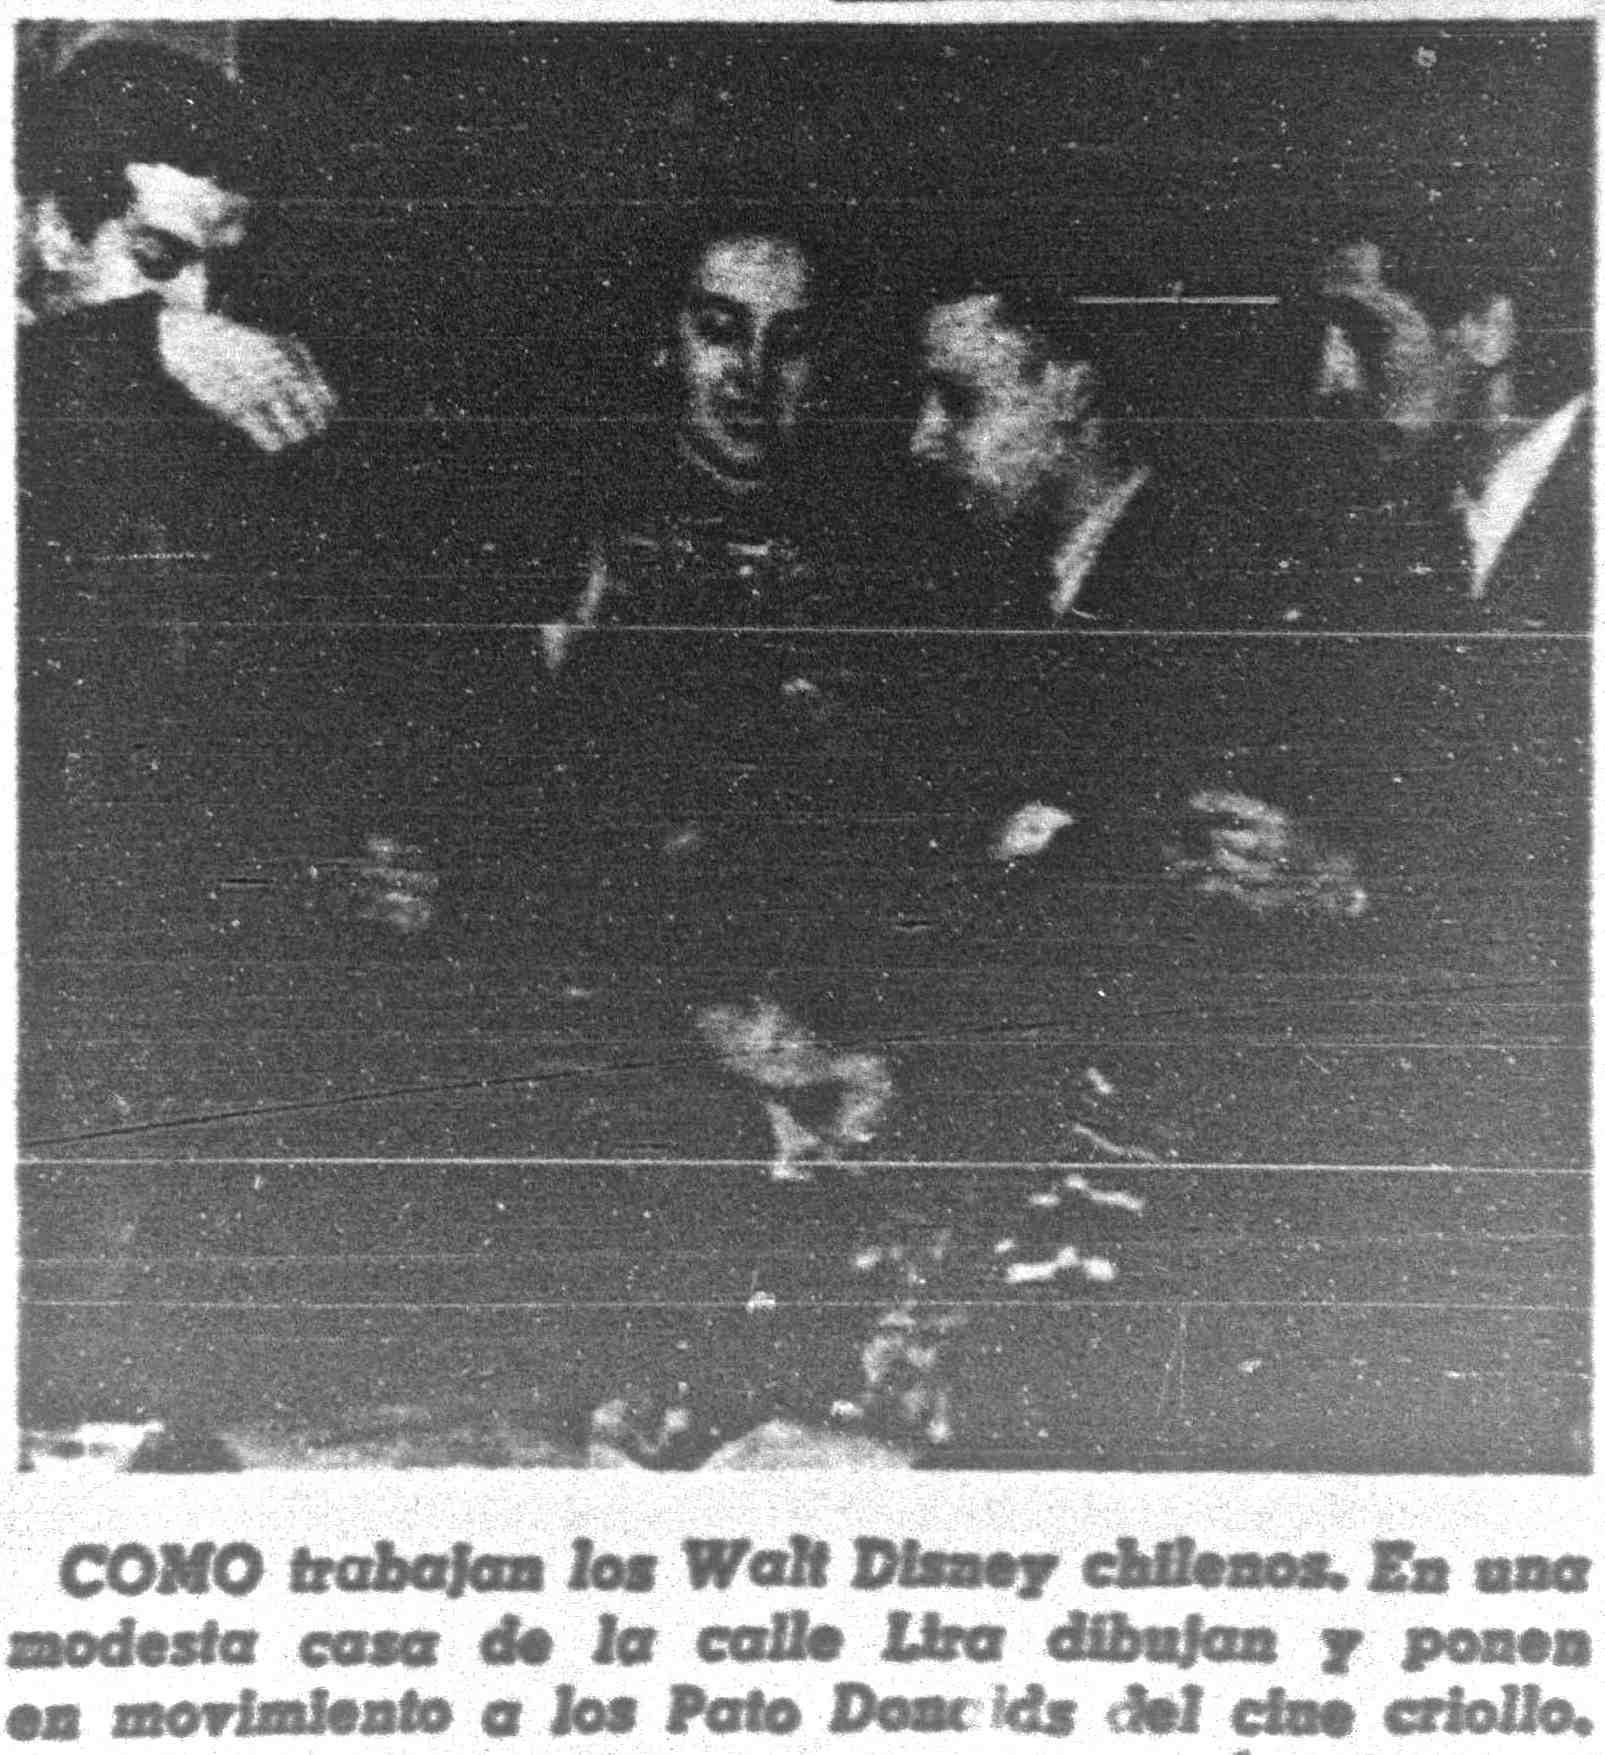 19411008_vea_stgo_Escudero_Trupp_FOTO01_baja.jpg